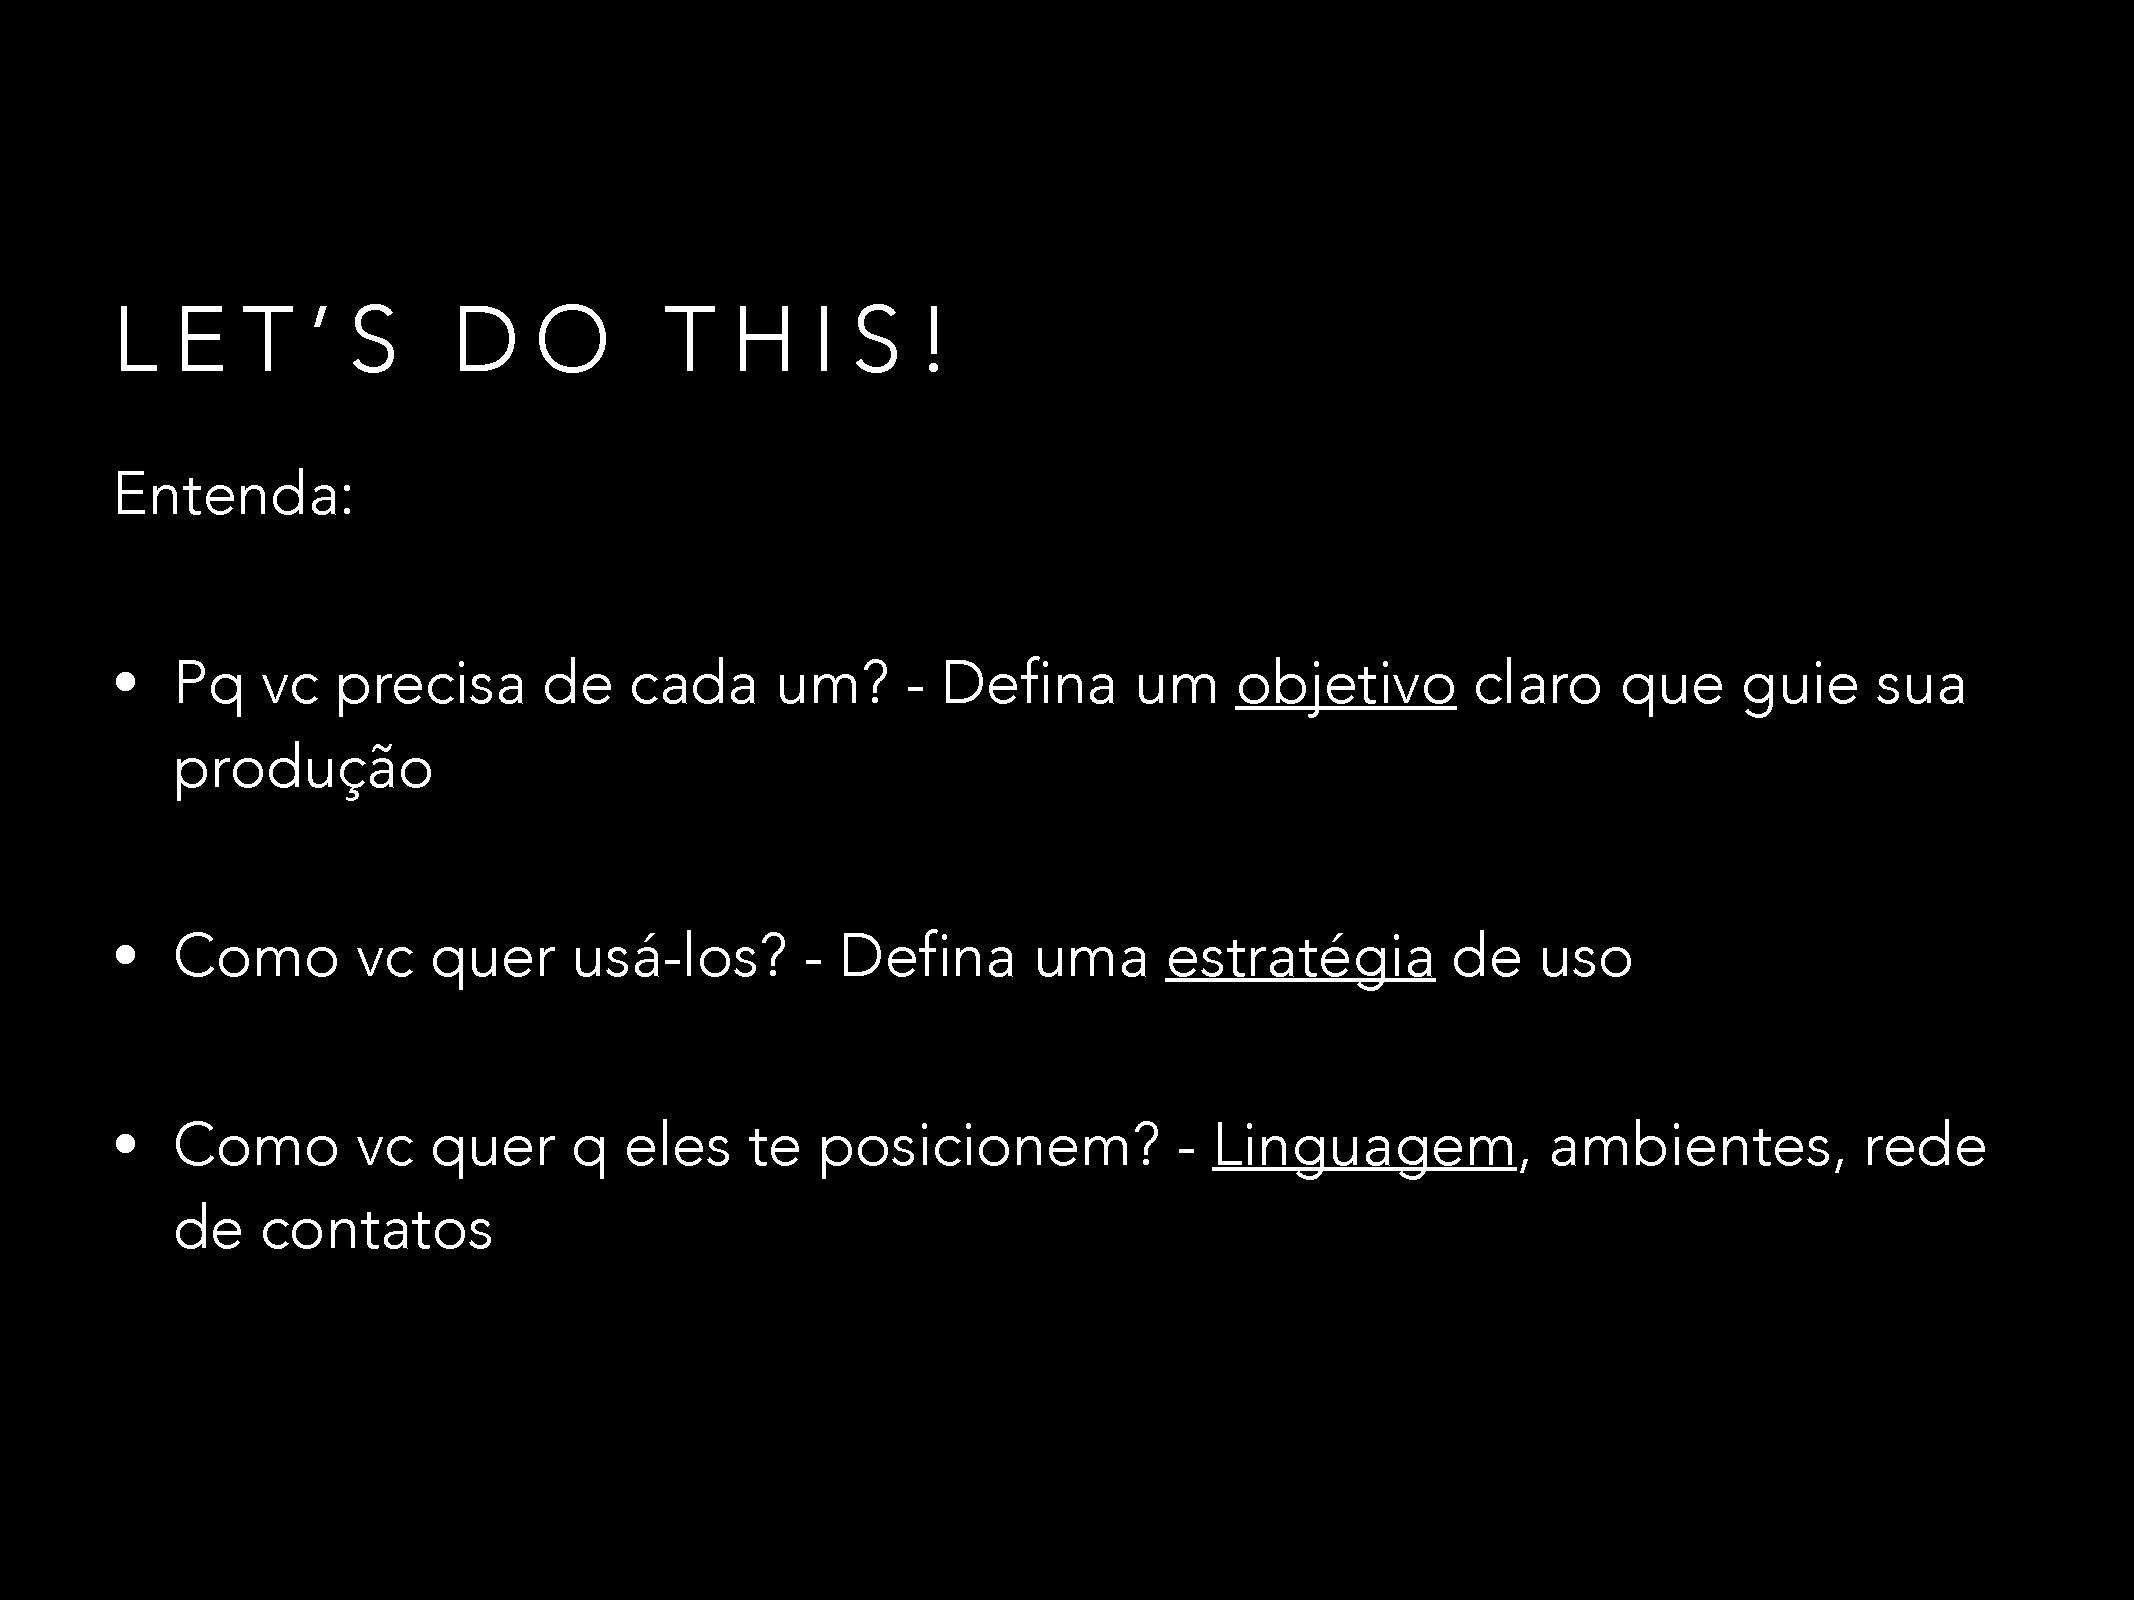 PORTIFA COMOFAZ? - Hellem Pedroso_Page_06.jpg